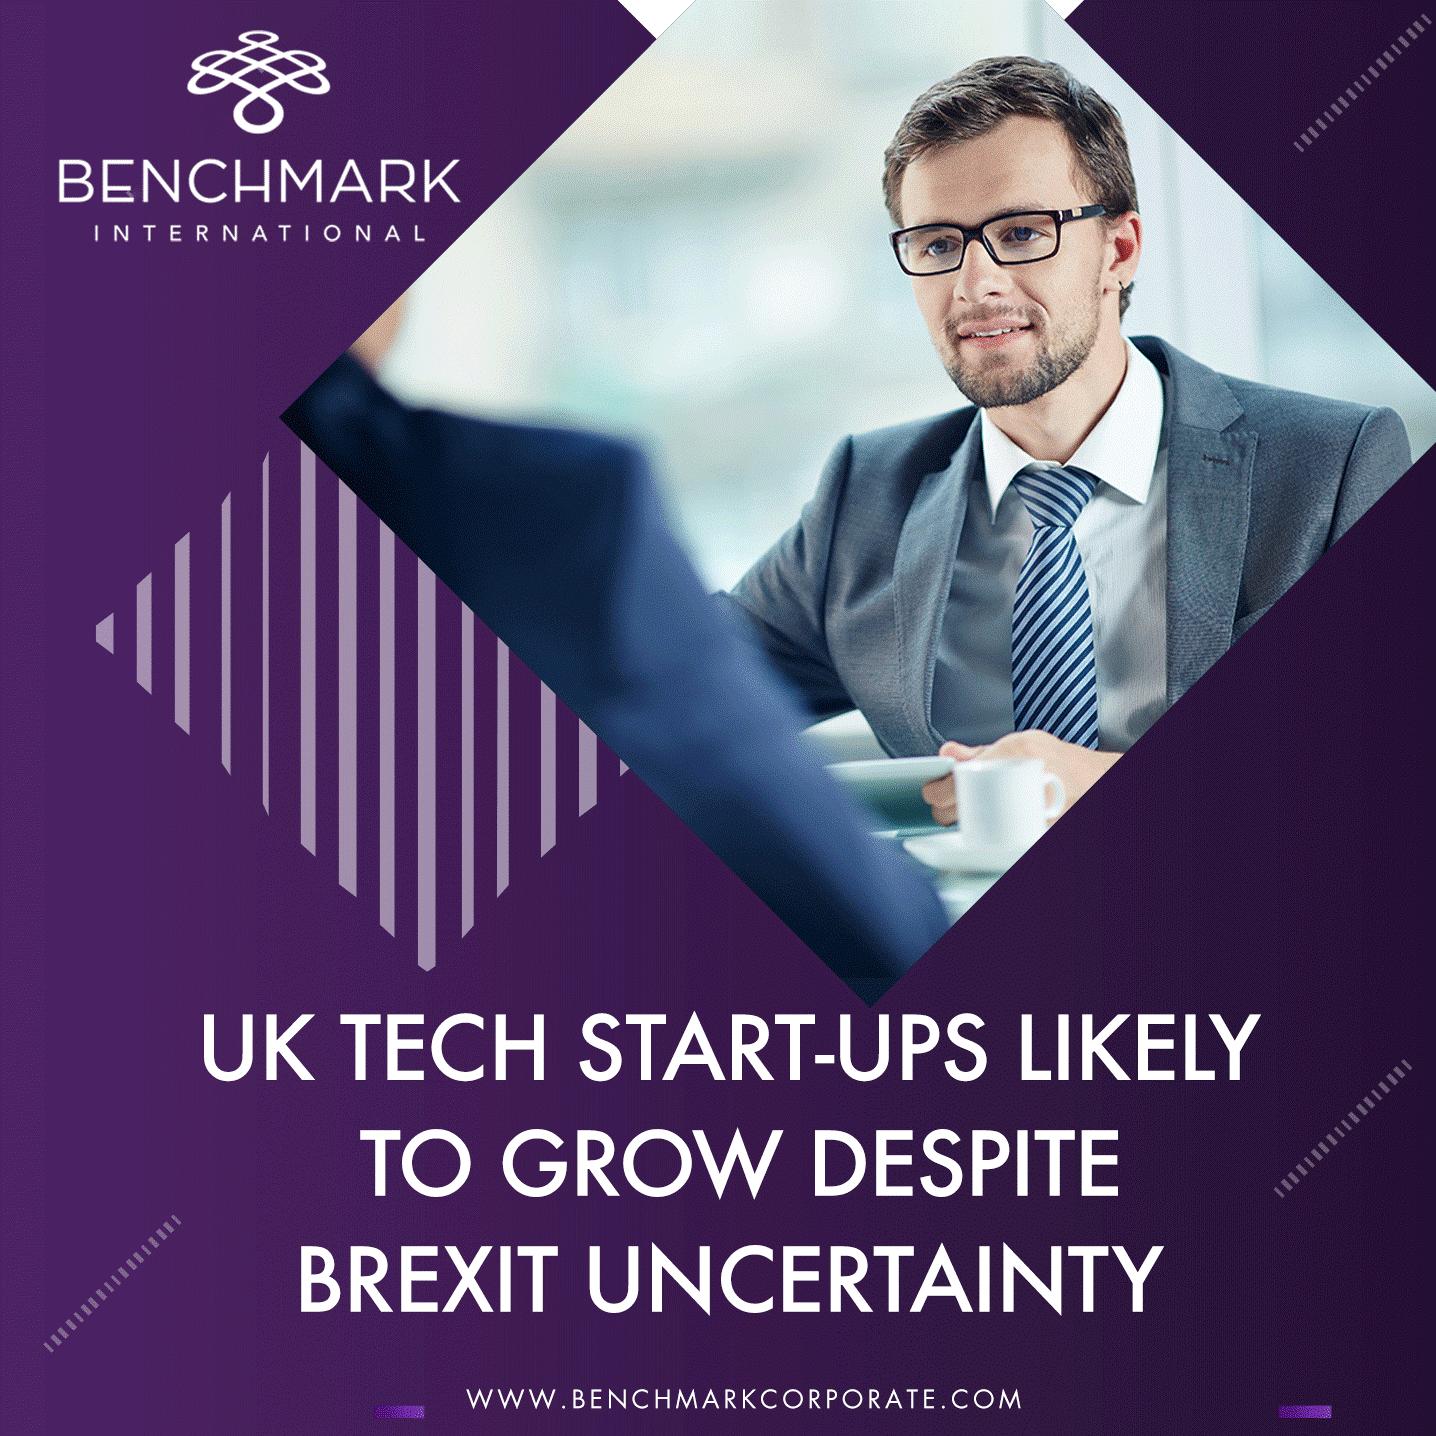 UK Tech Start-Ups Portrait